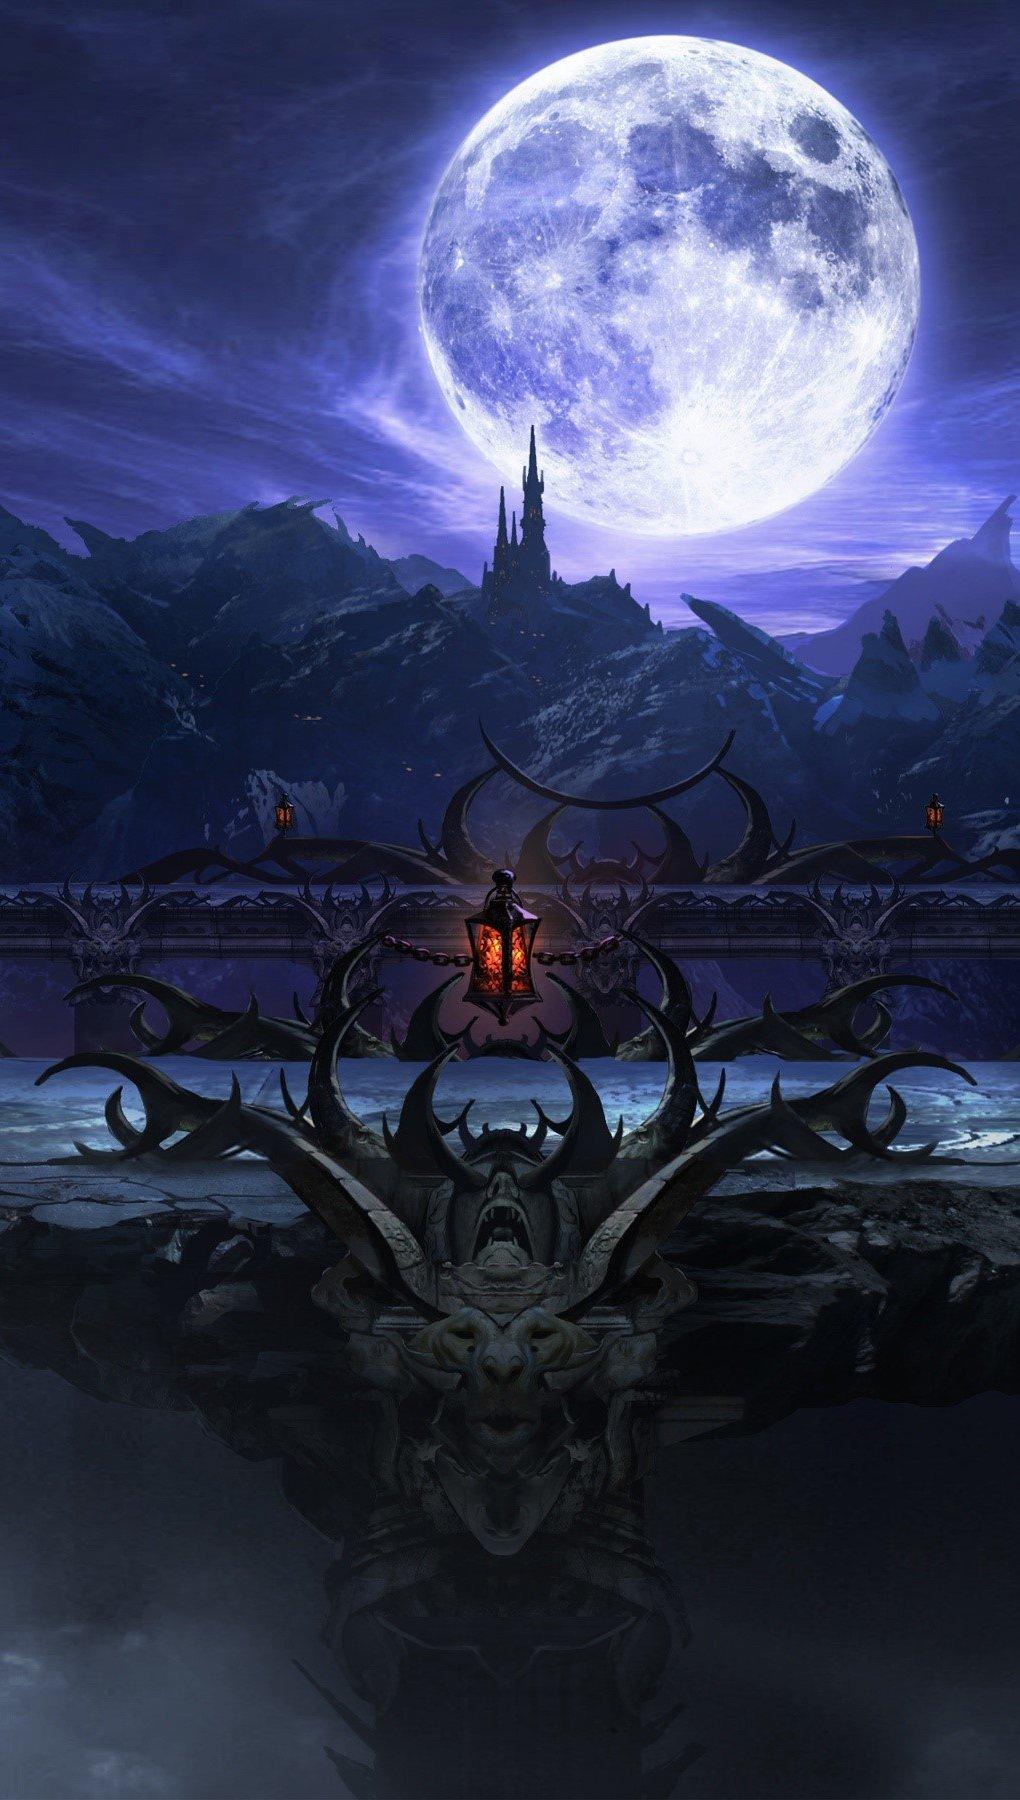 Wallpaper Mortal Kombat X Stage Vertical